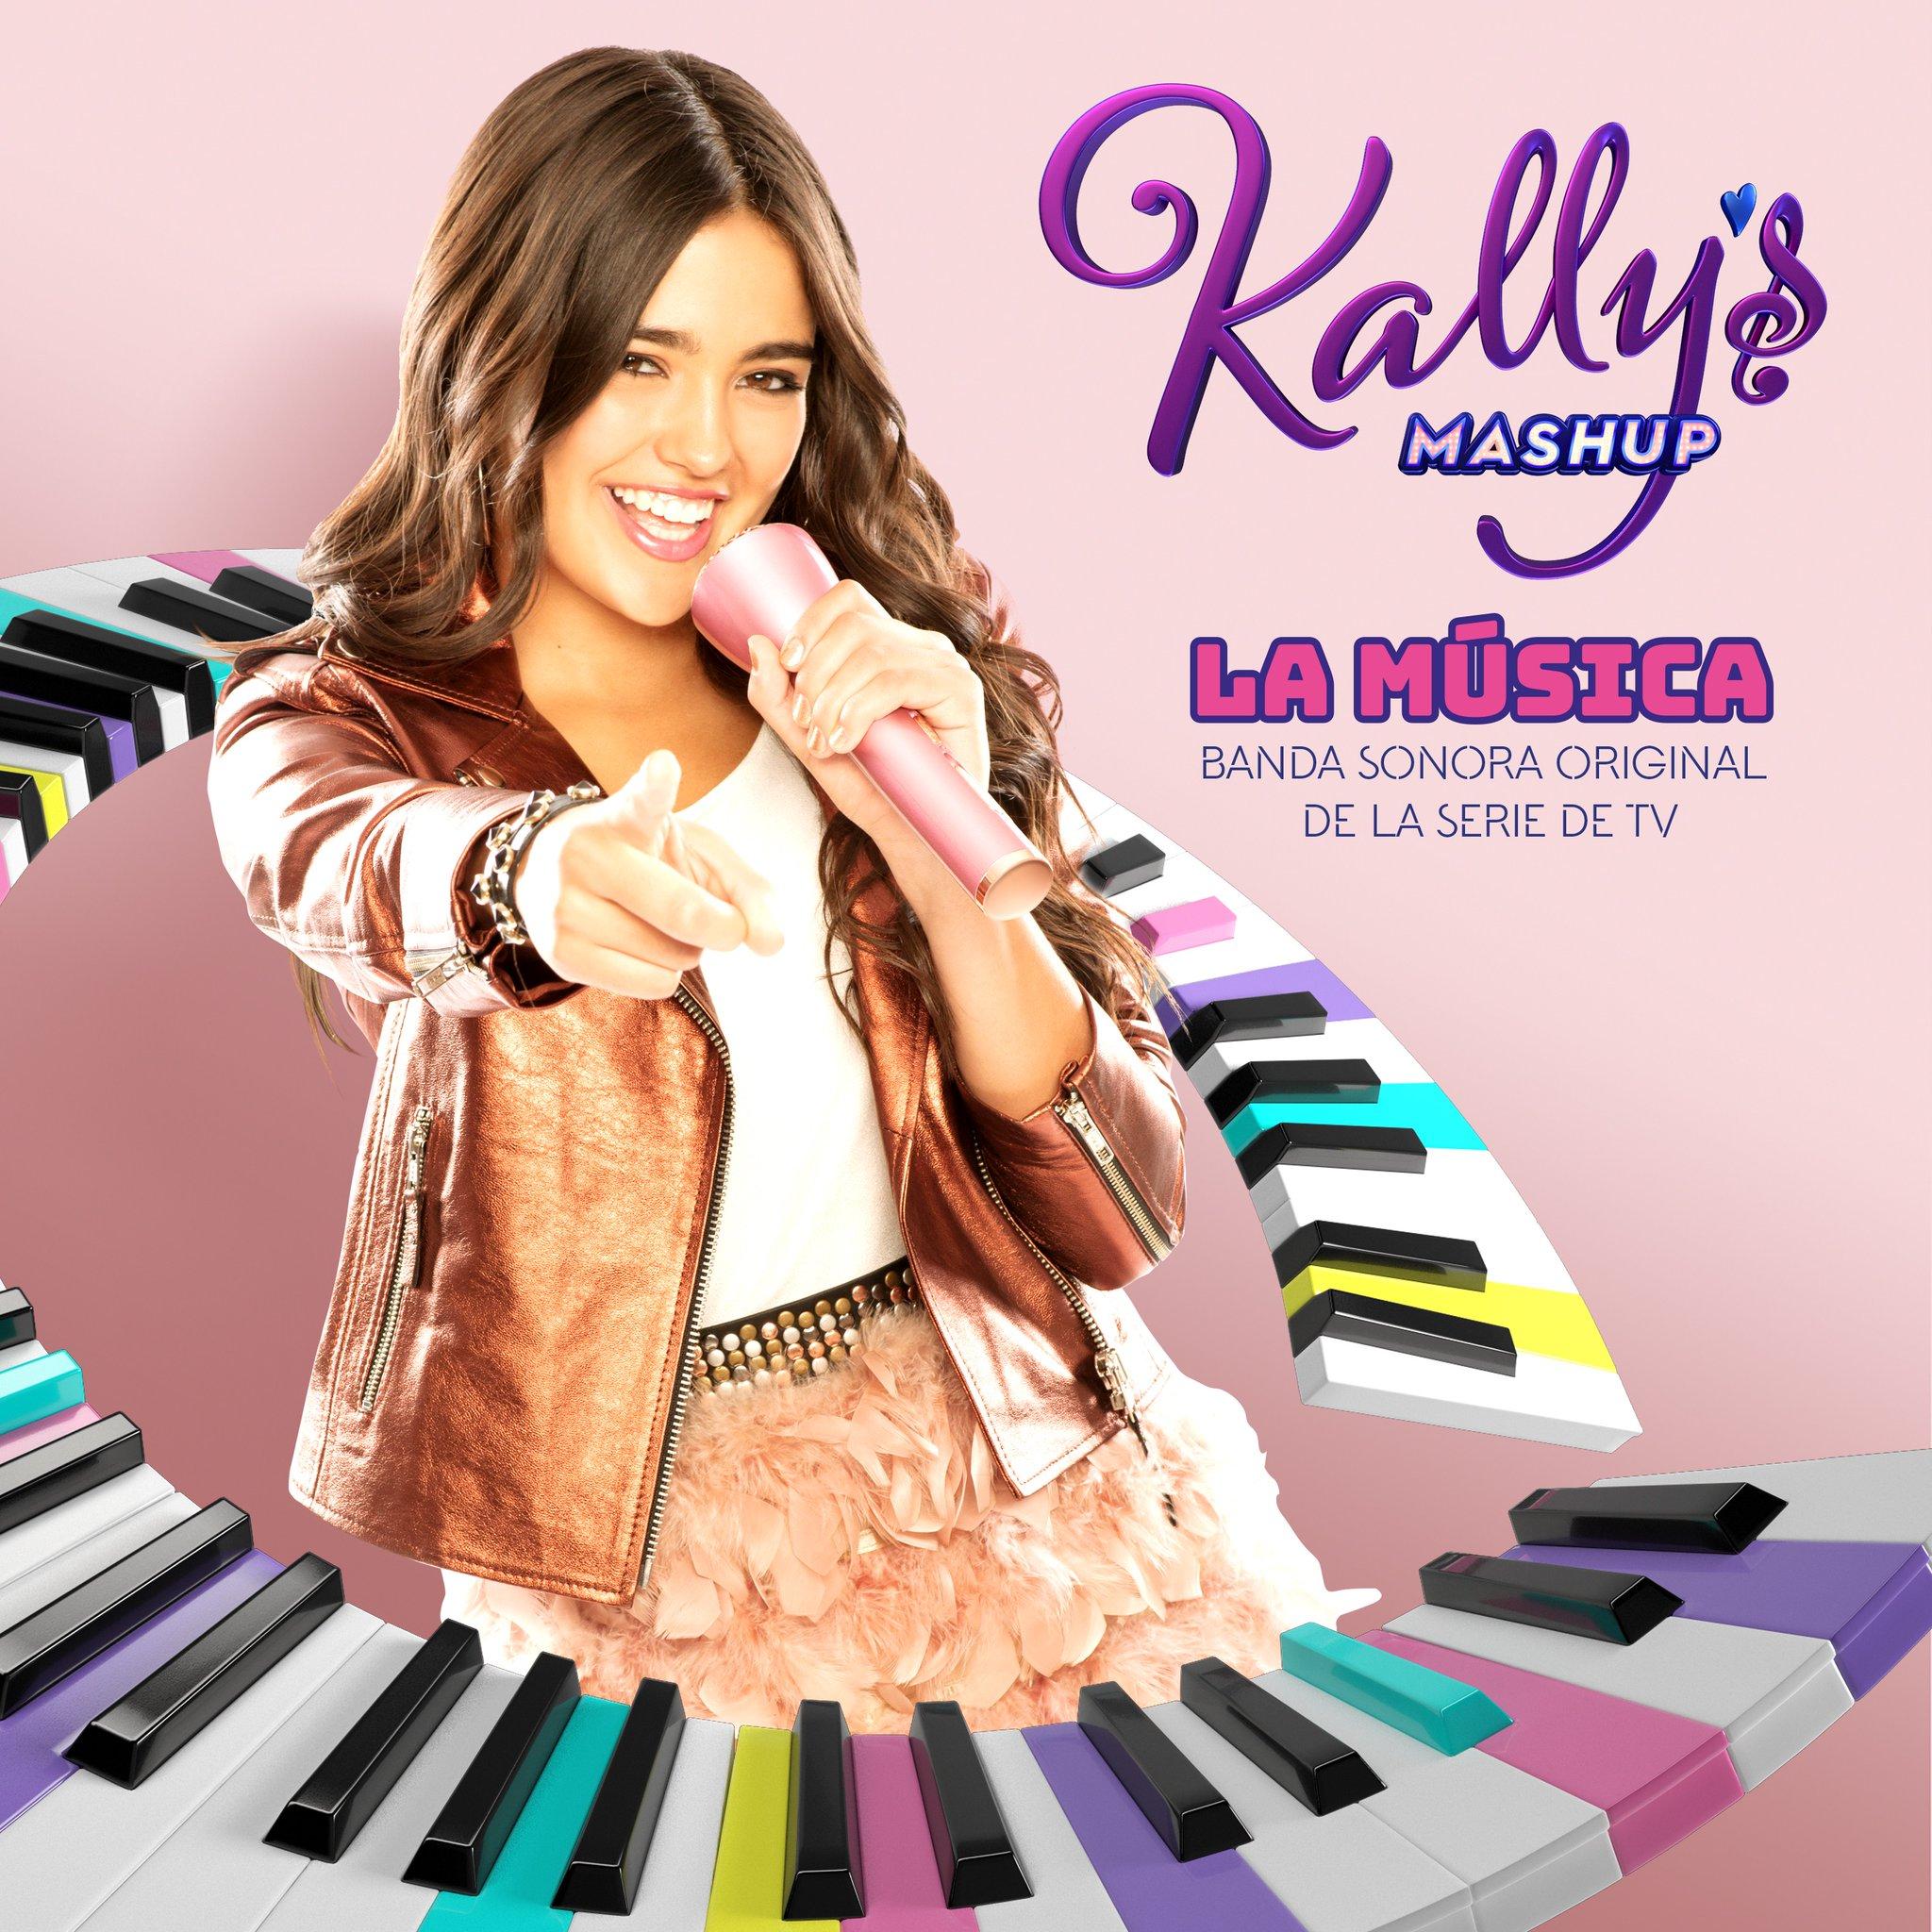 Kally 39 s mashup kally 39 s mashup primera temporada for Habitacion de kally s mashup